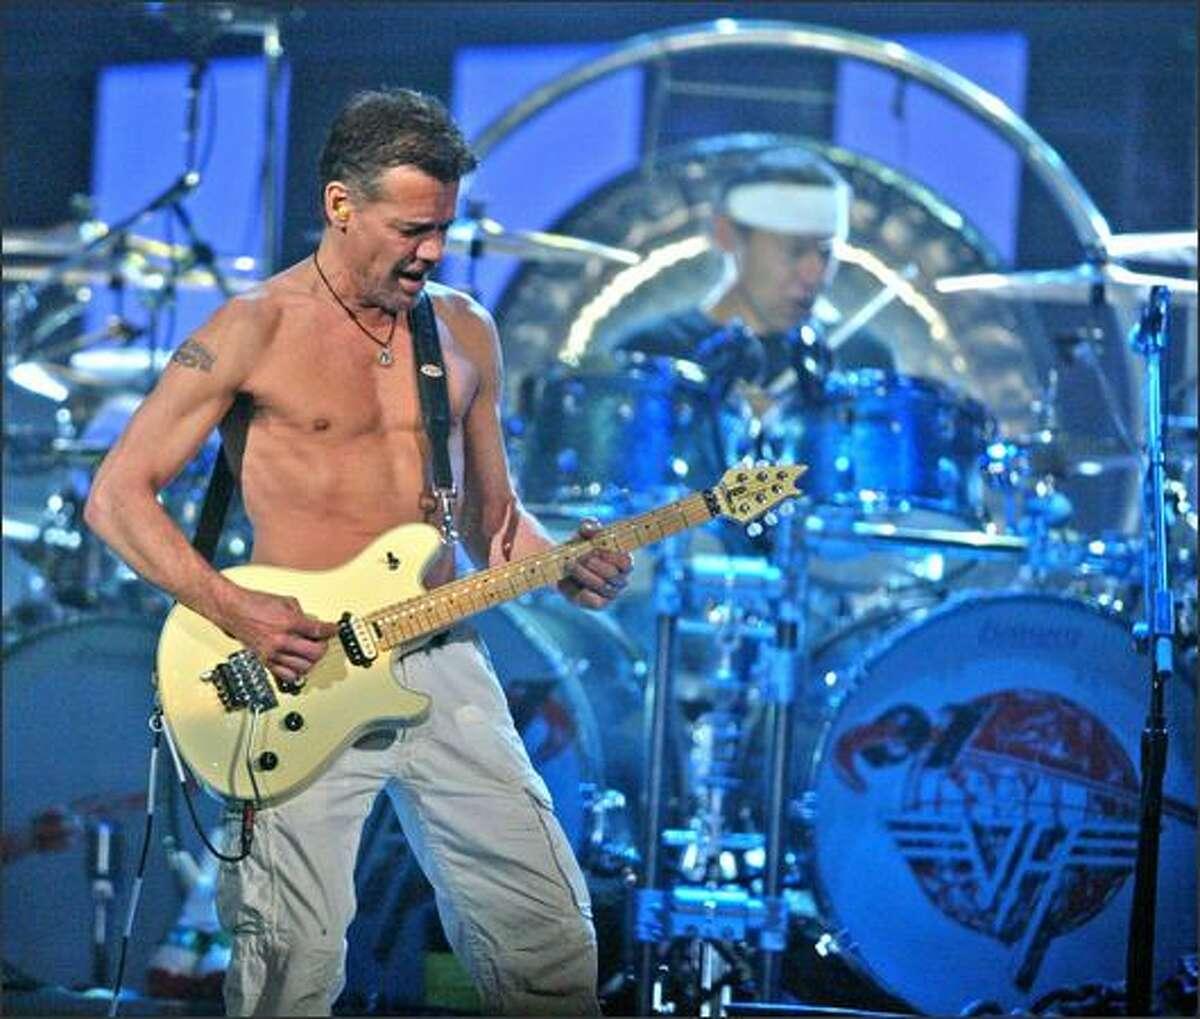 Eddie Van Halen, left, and his brother, Alex on the drums.